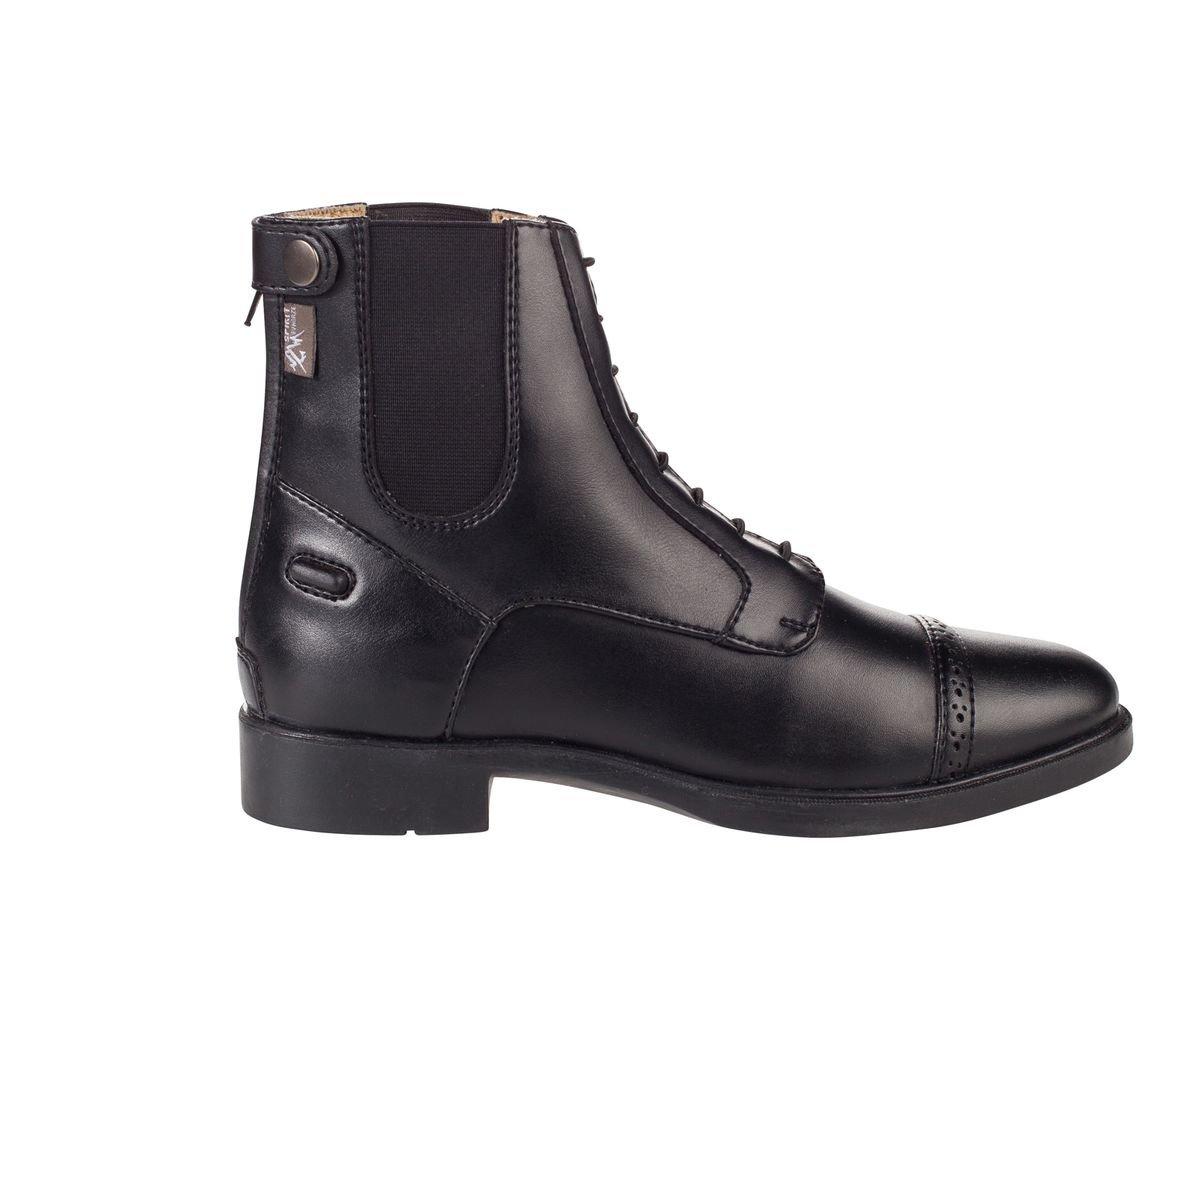 Horze Child 's Spirit Kilkenny Jodhpurs Paddock Boots with Zipper in Back and laced-up Loook US 3.5/EU 31  B012TRAREU